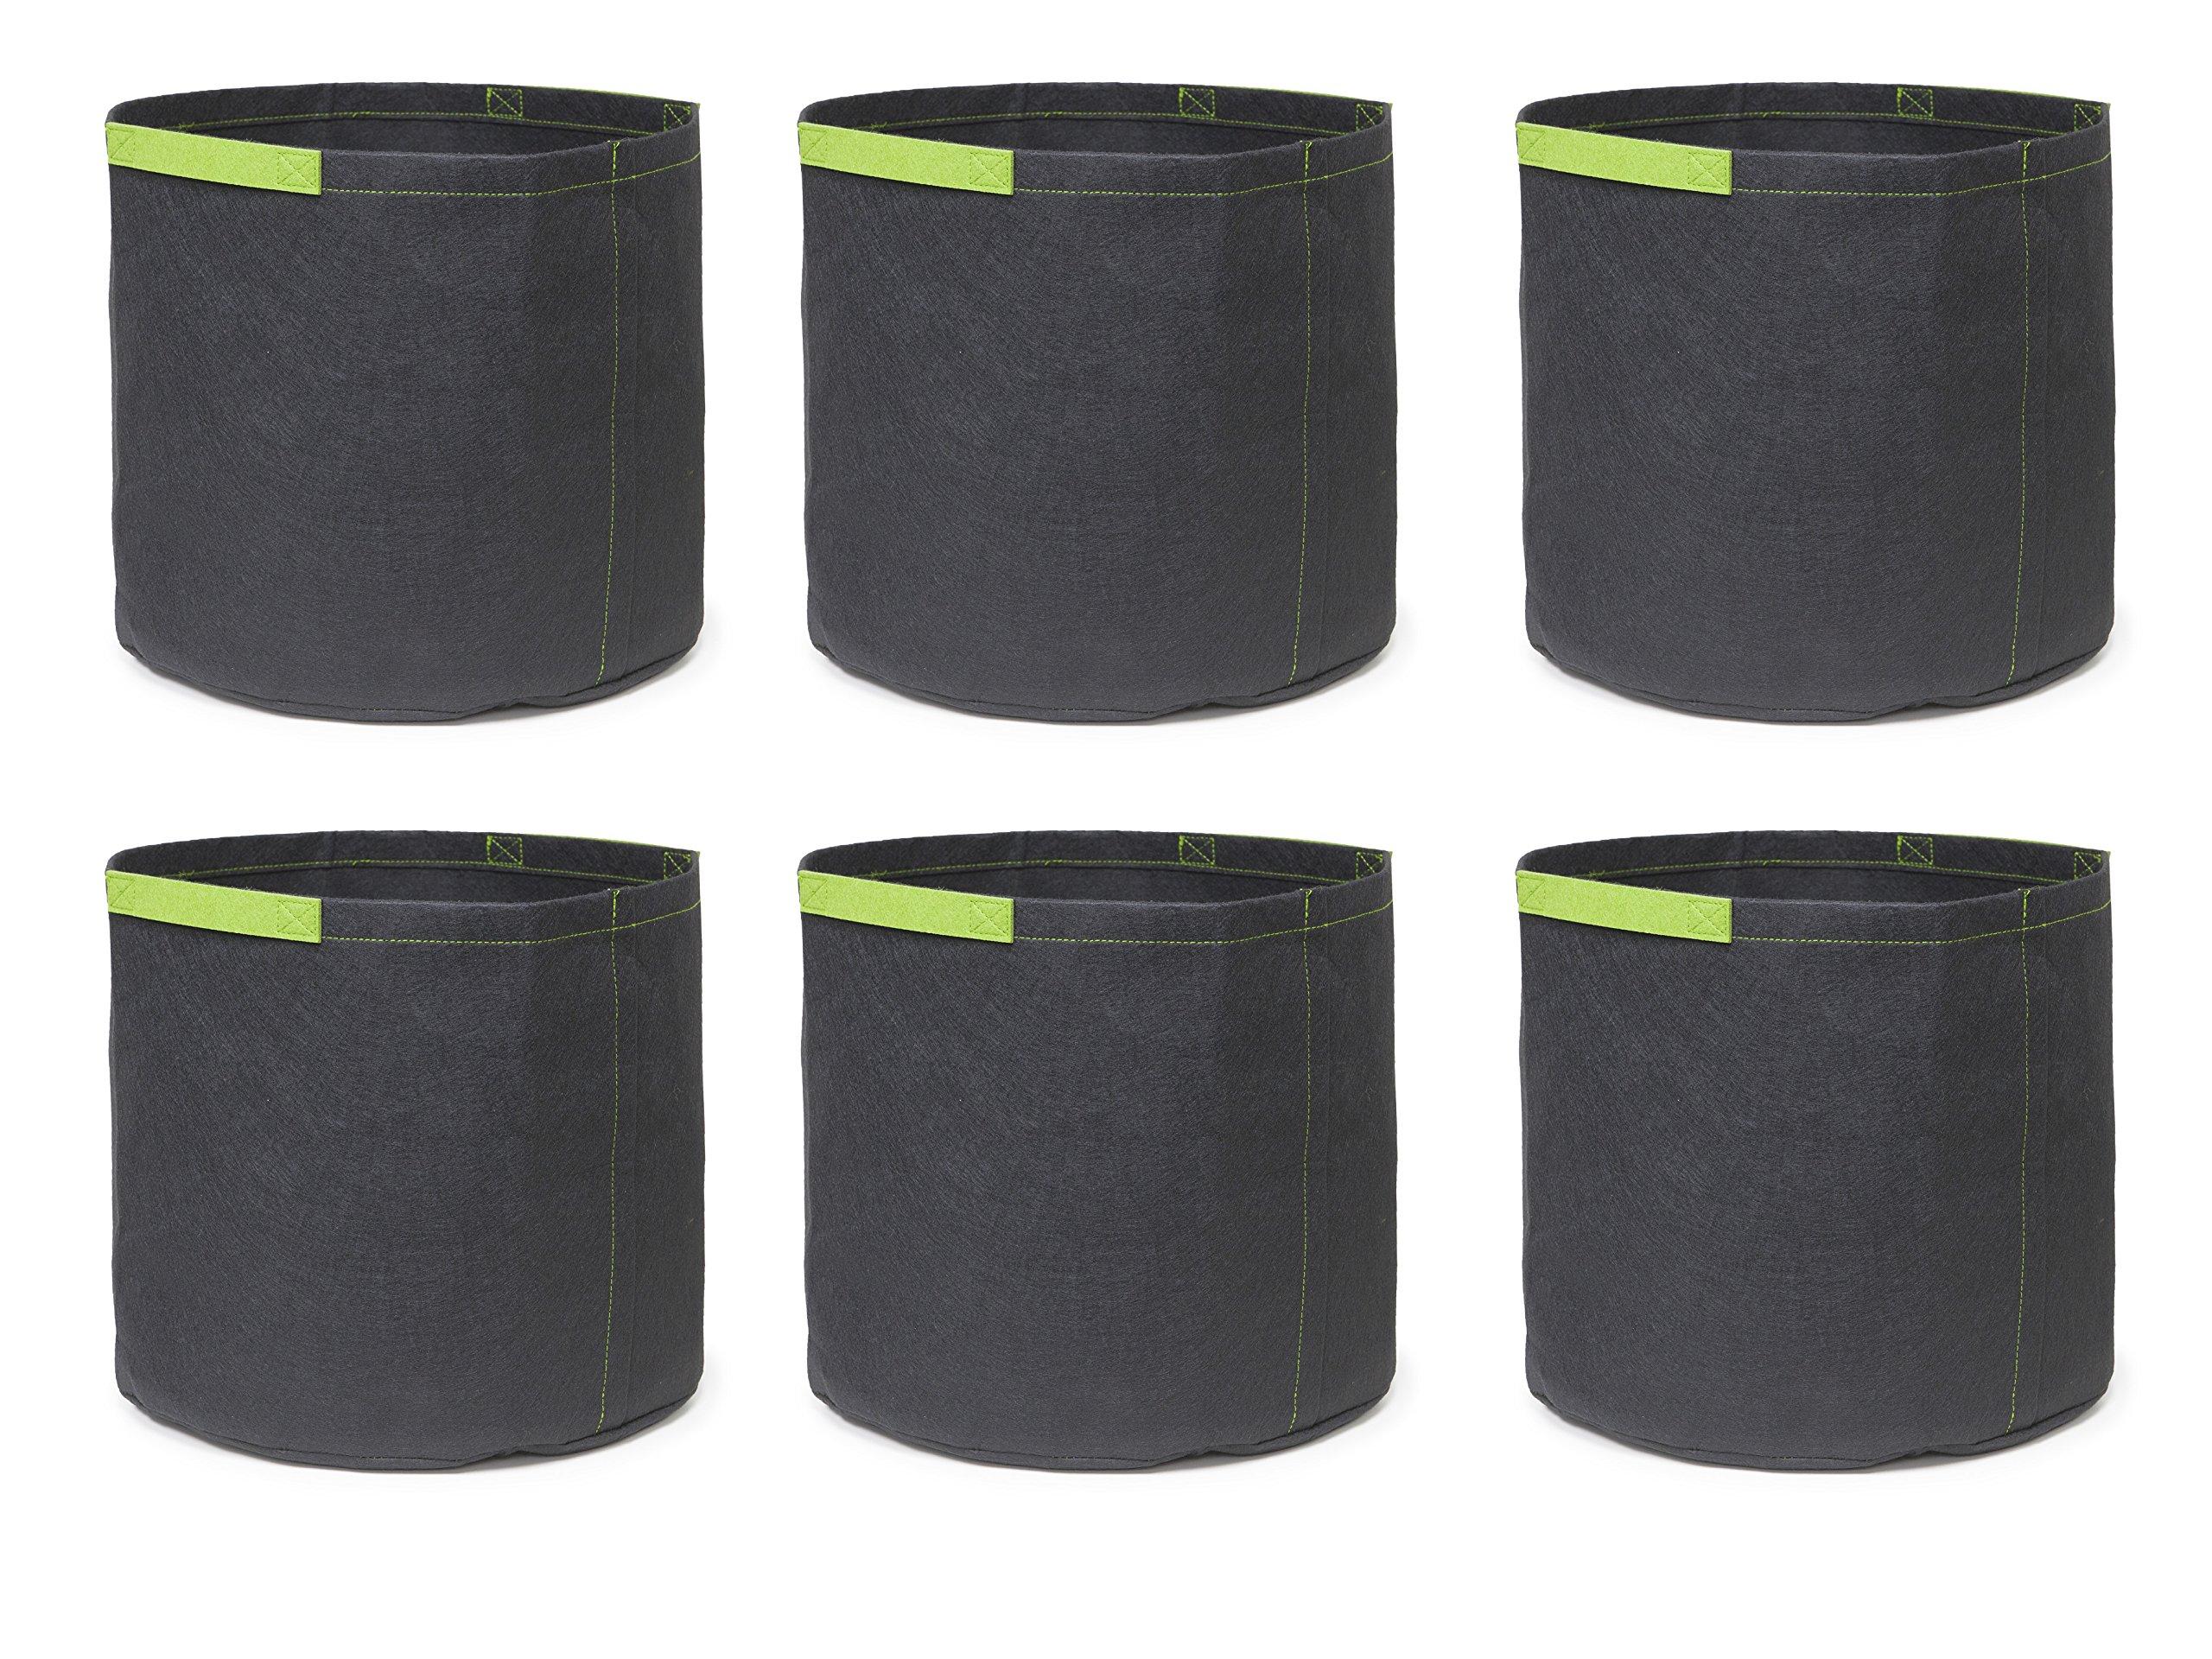 247Garden 6-Pack 3 Gallon Grow Bags/Aeration Fabric Pots w/Handles (Black w/Short Handles)